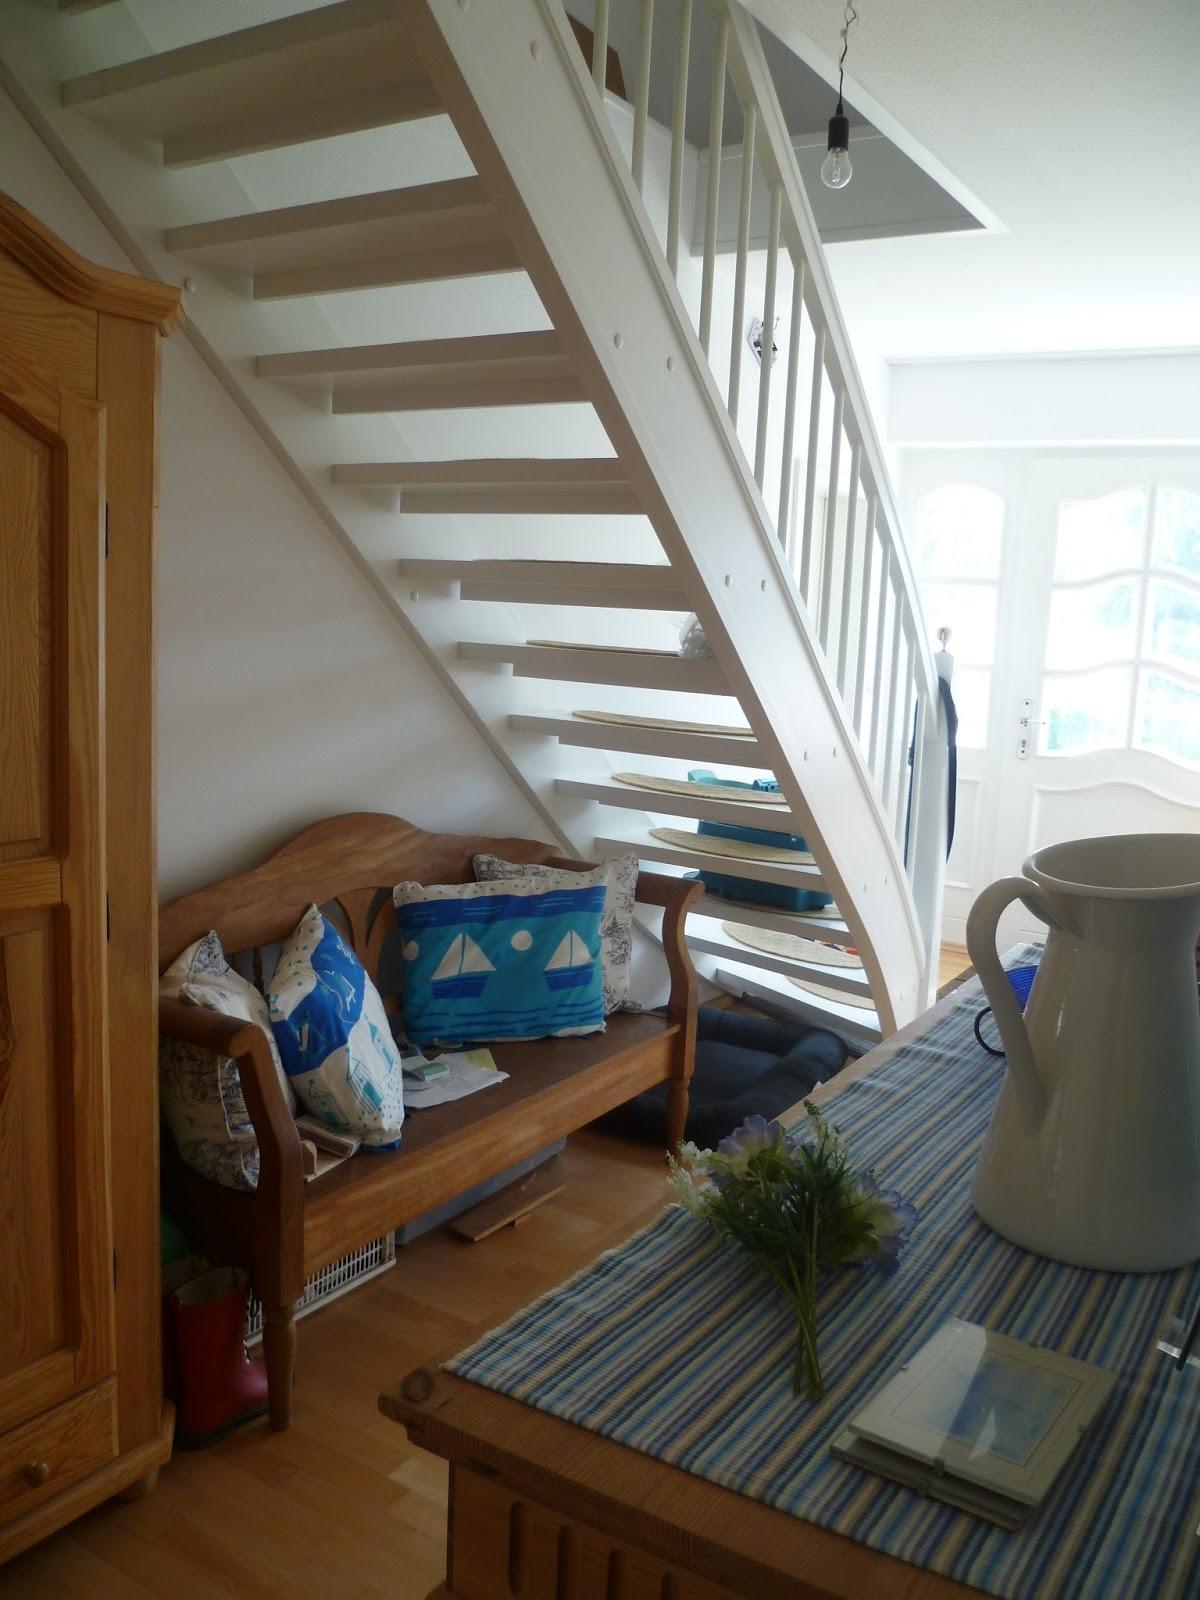 papierkorb inspirationen aus der heide juli 2013. Black Bedroom Furniture Sets. Home Design Ideas